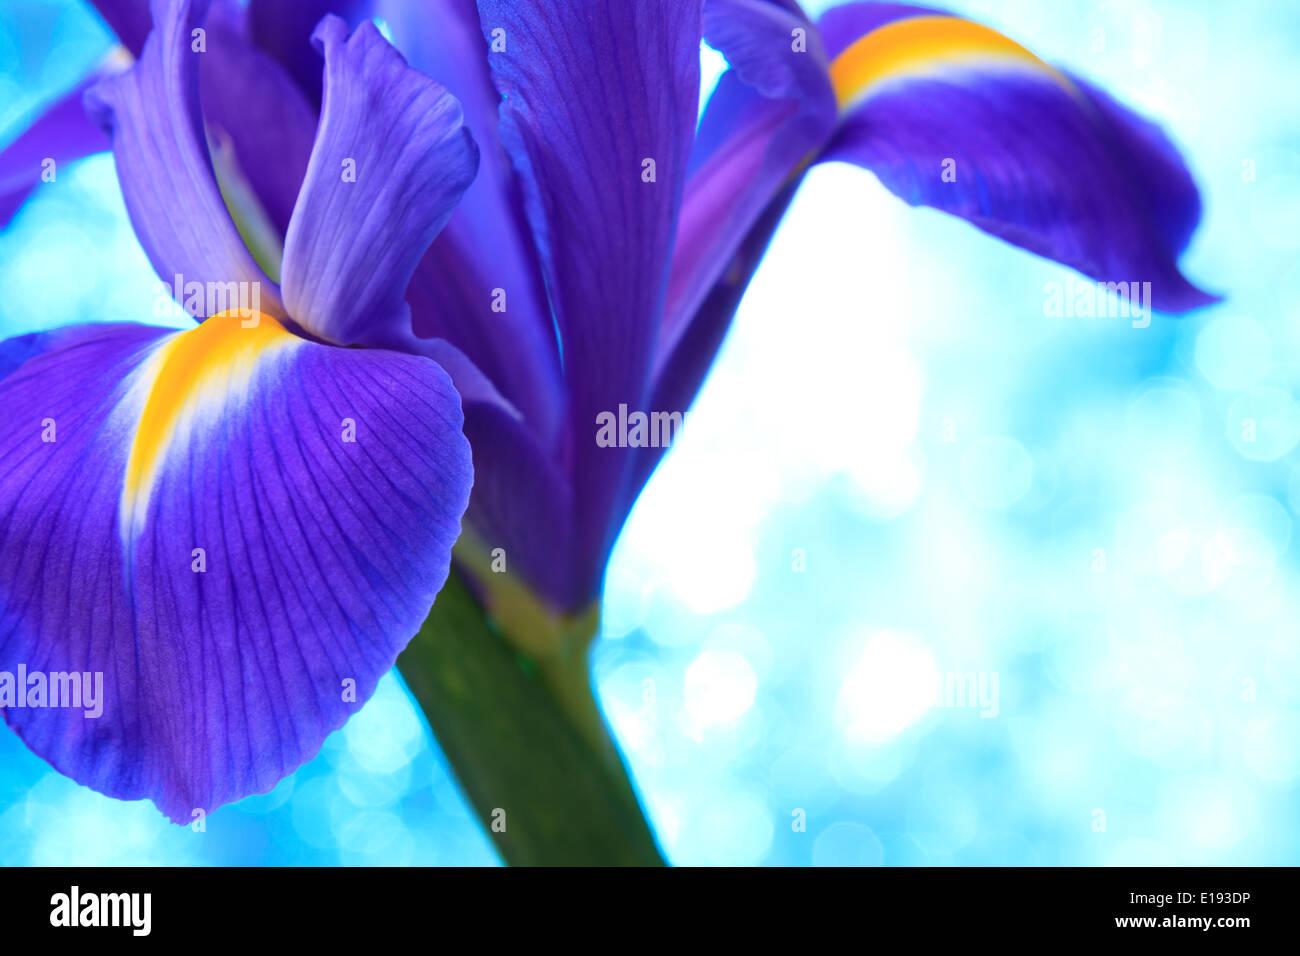 Iris flowers halifax image collections flower wallpaper hd iris flowers halifax choice image flower wallpaper hd iris flowers halifax gallery flower wallpaper hd pic izmirmasajfo